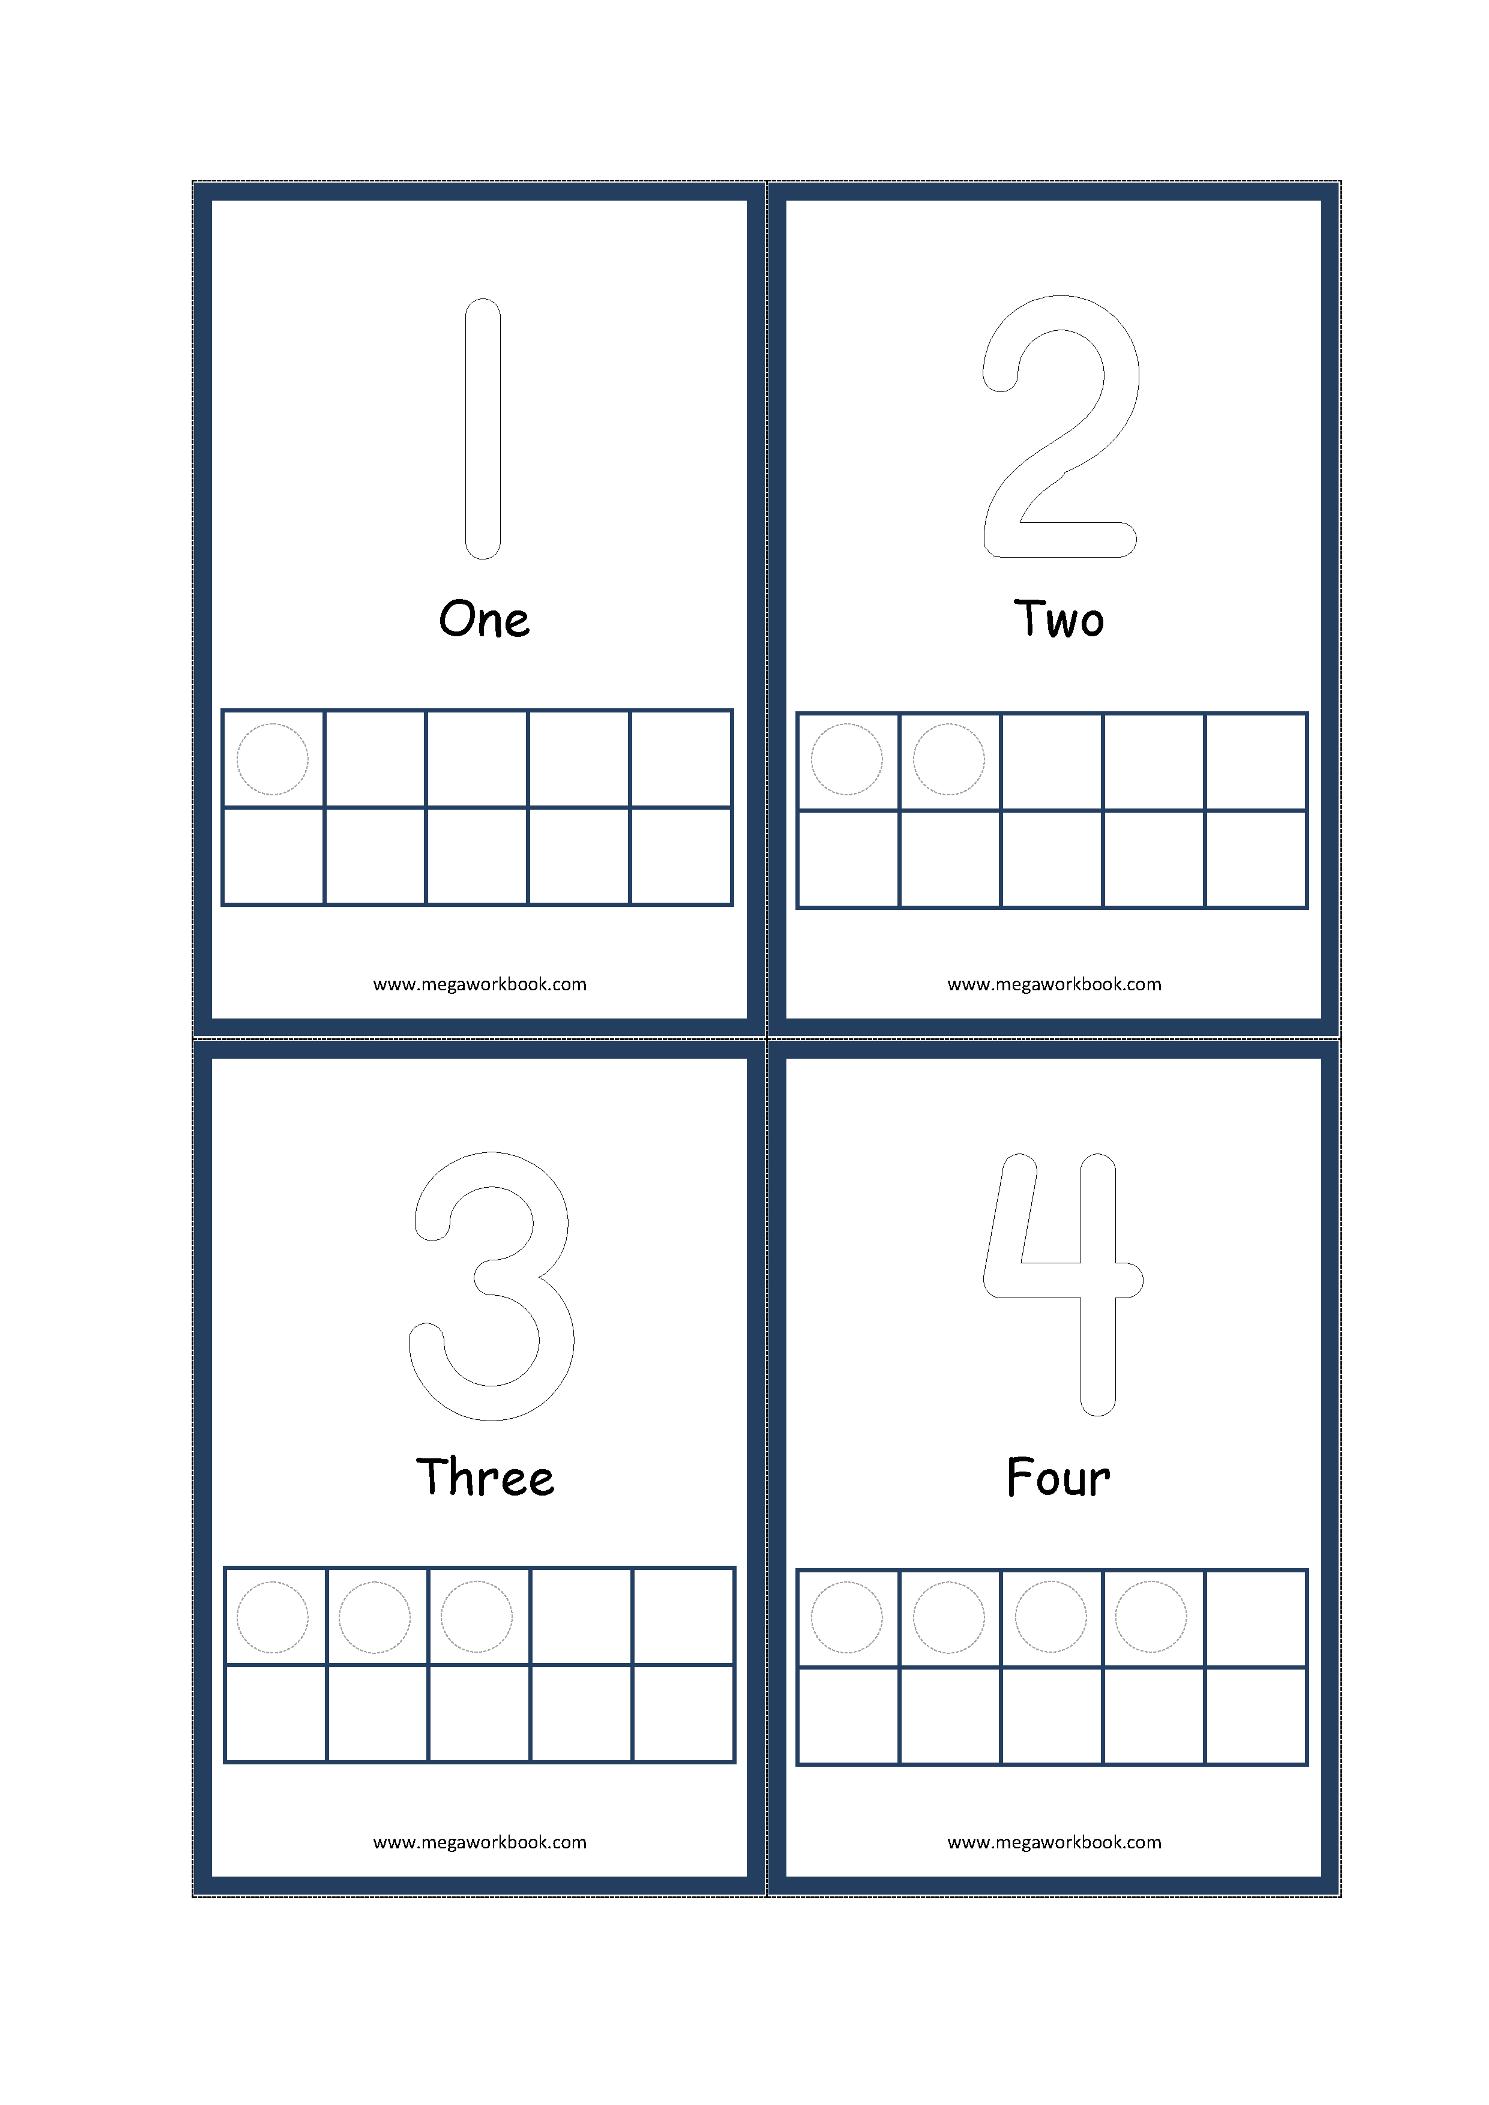 image regarding Ten Frame Printable identify 10 Body Printables - 10 Body Math Counting Game 1-10